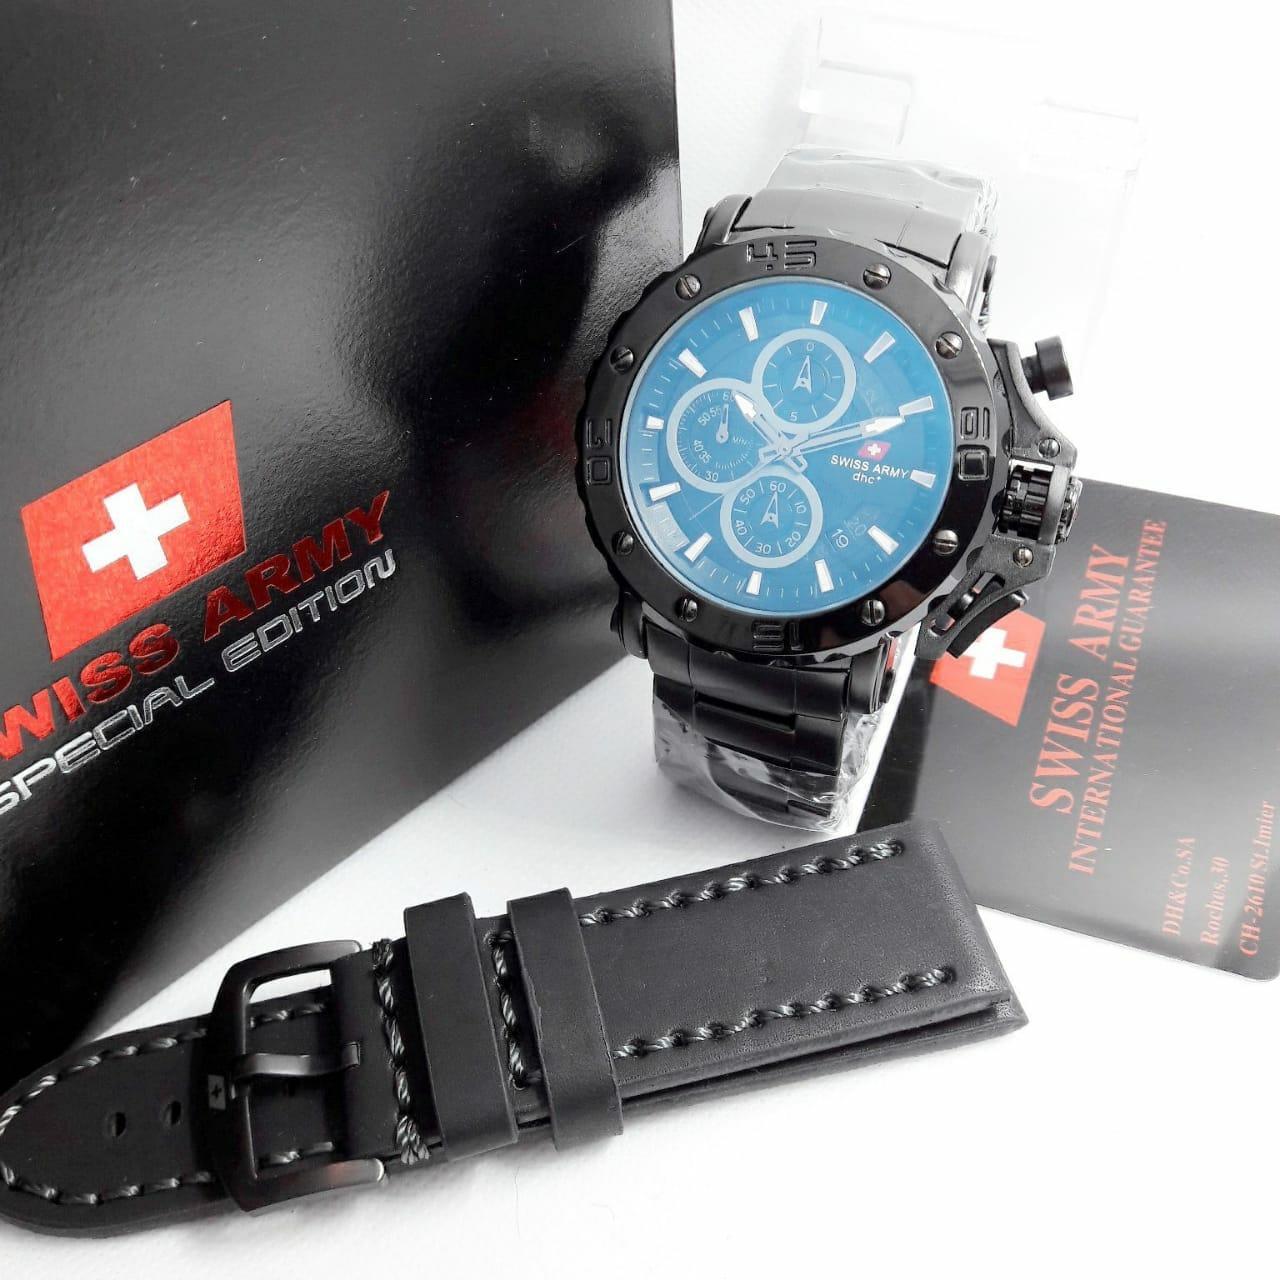 Swiss Army Sa9205 - Jam Tangan Original 100% Fashion Pria - Fiture Chronograph Active -